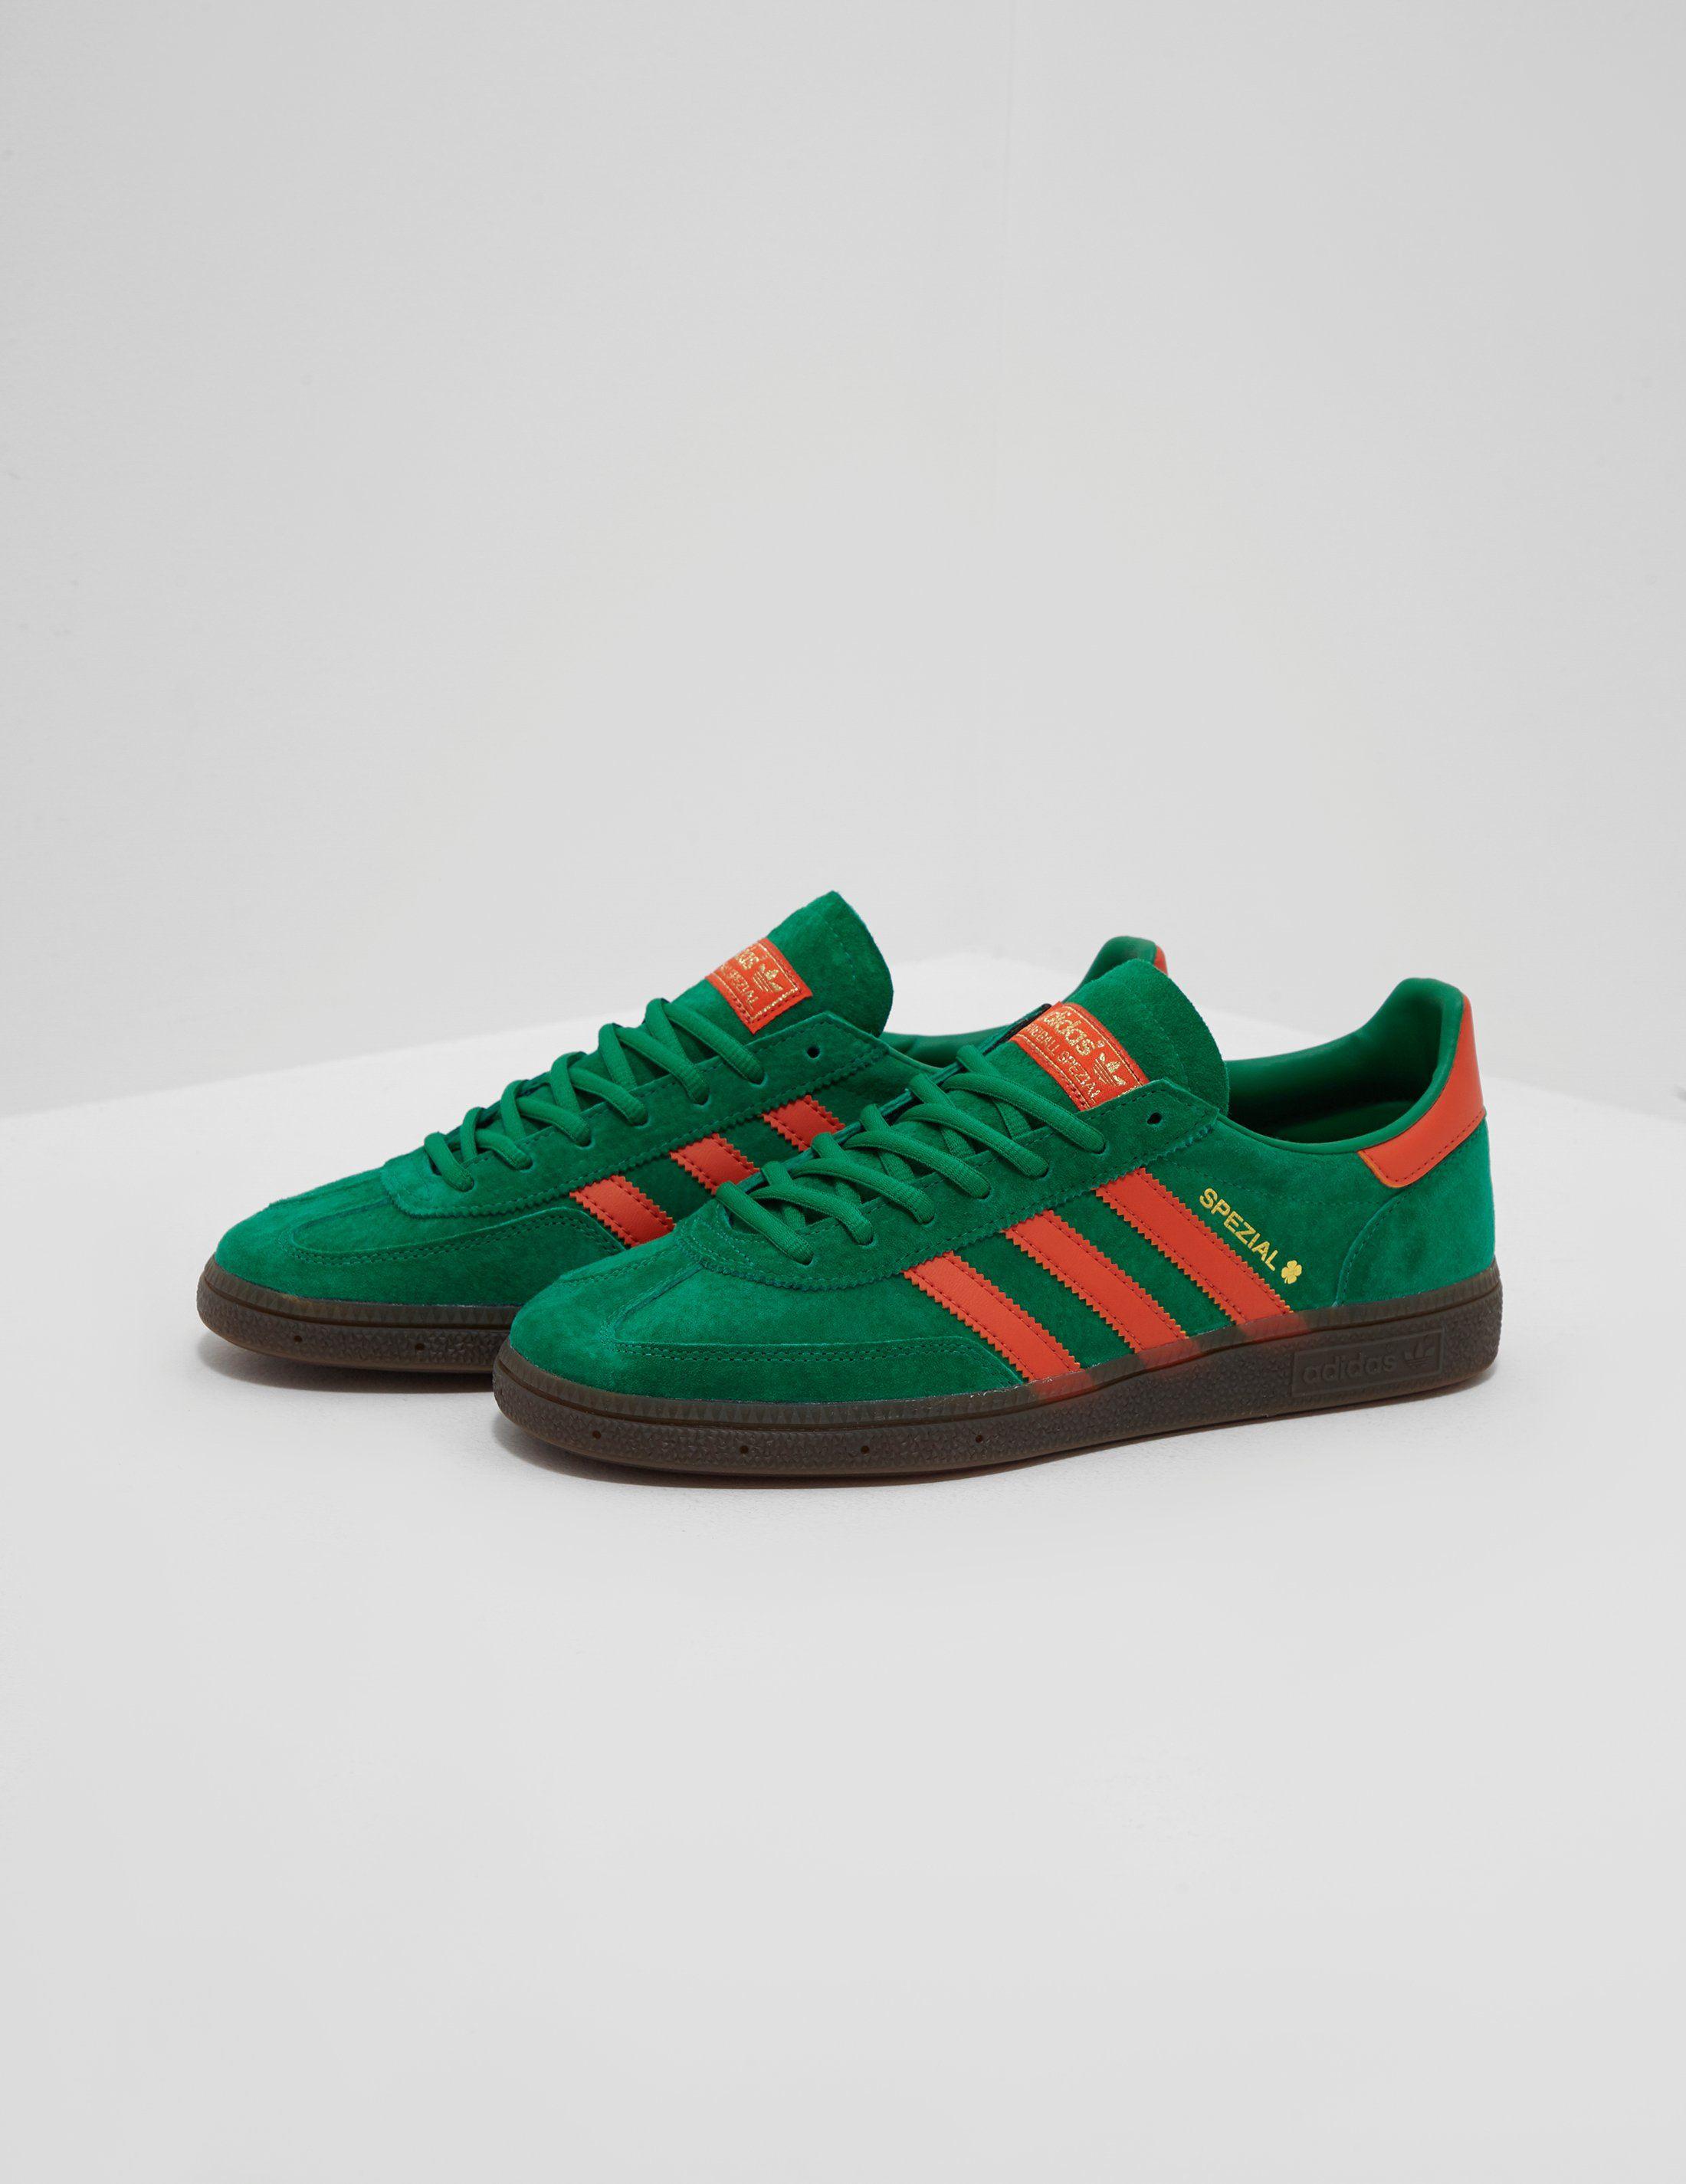 adidas Originals Handball Spezial St Patrick's Day